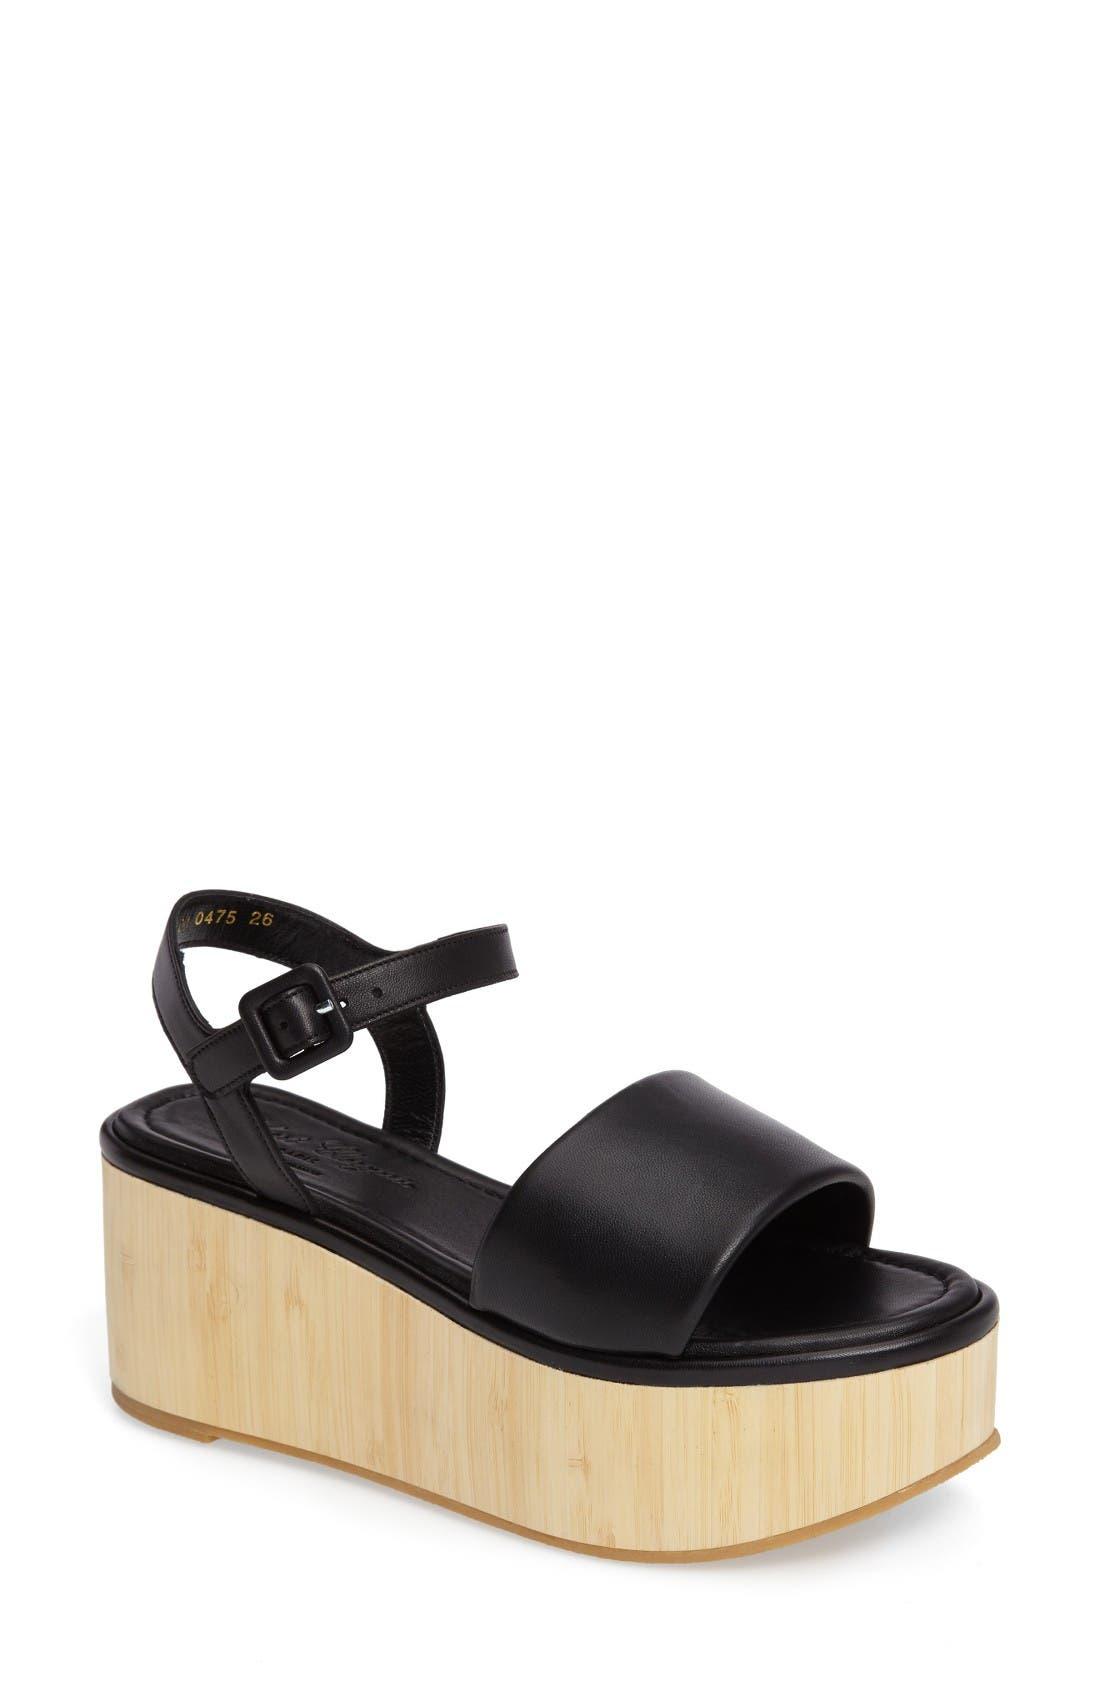 ROBERT CLERGERIE Flap Platform Sandal